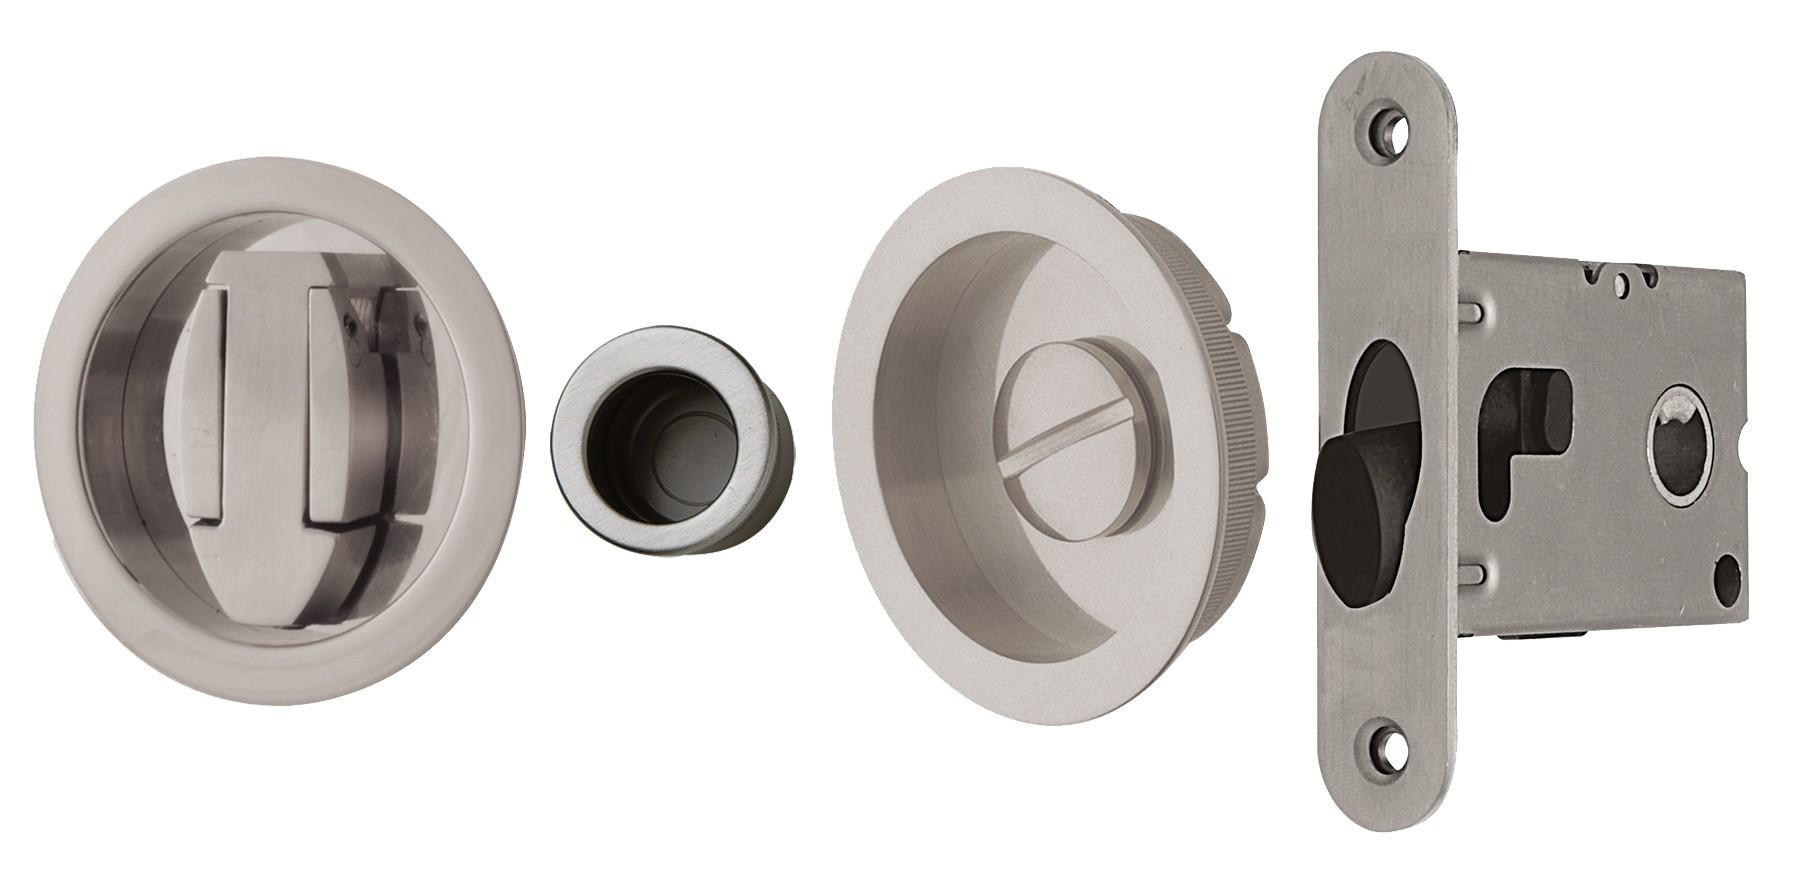 Ahi Sdk091pv 45 Privacy Pocket Door Kit Polished Brass